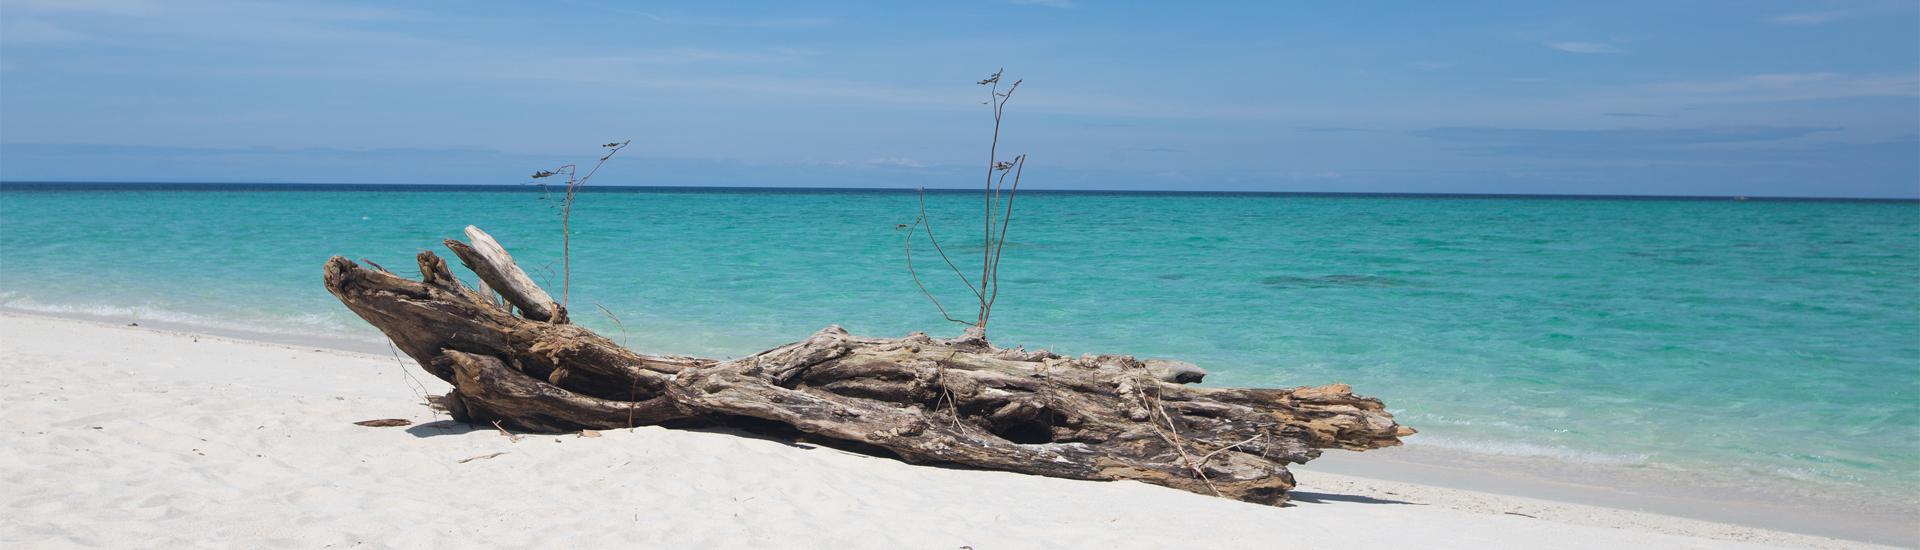 About the philippines magic oceans resort - Magic oceans dive resort ...